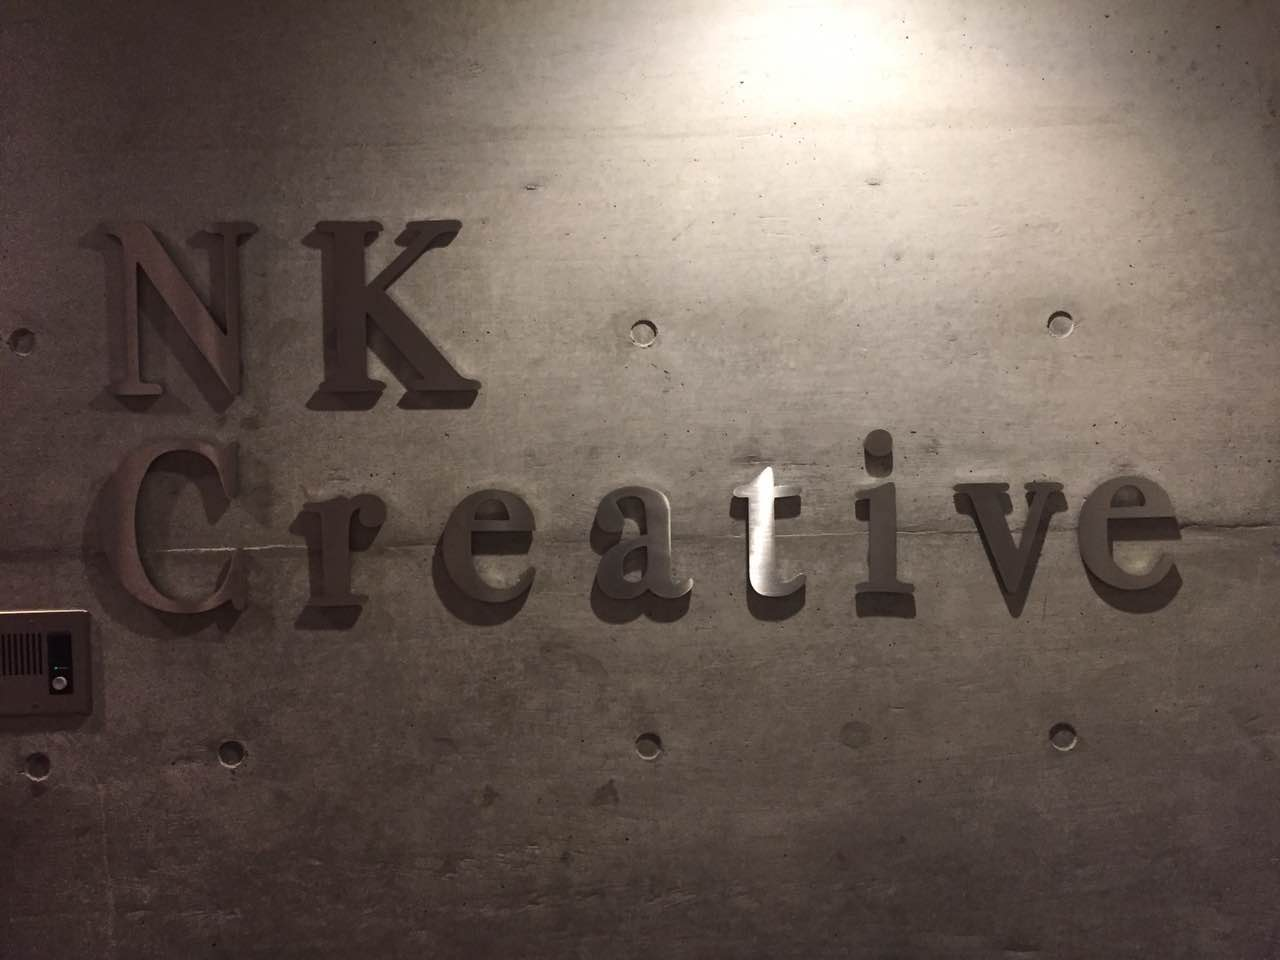 NKcreative 切文字